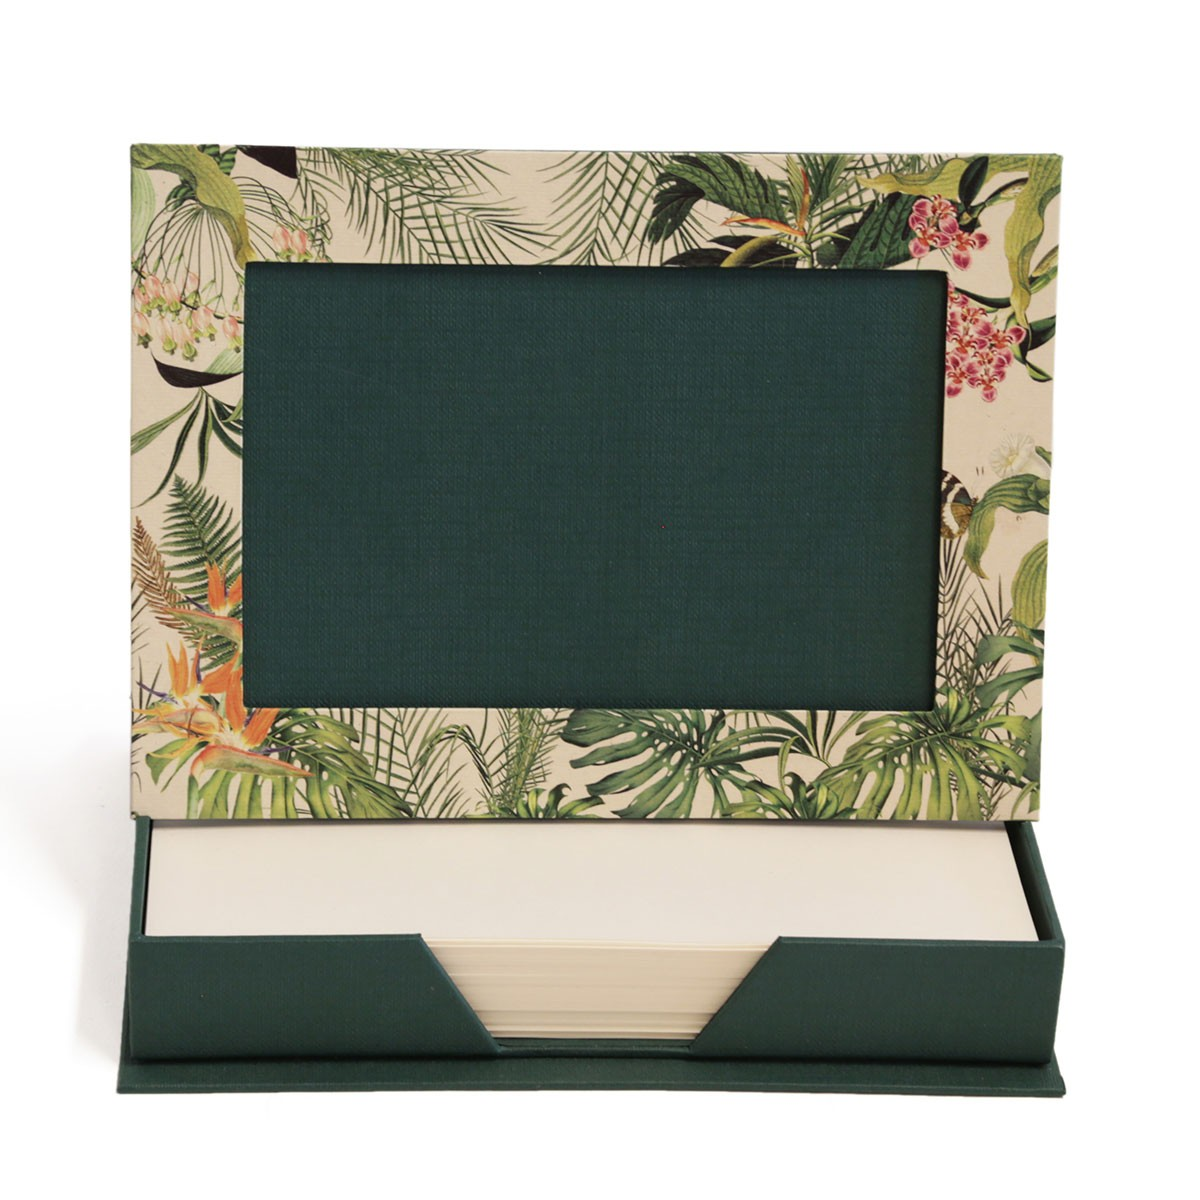 Caixa porta retrato (Tropicália)